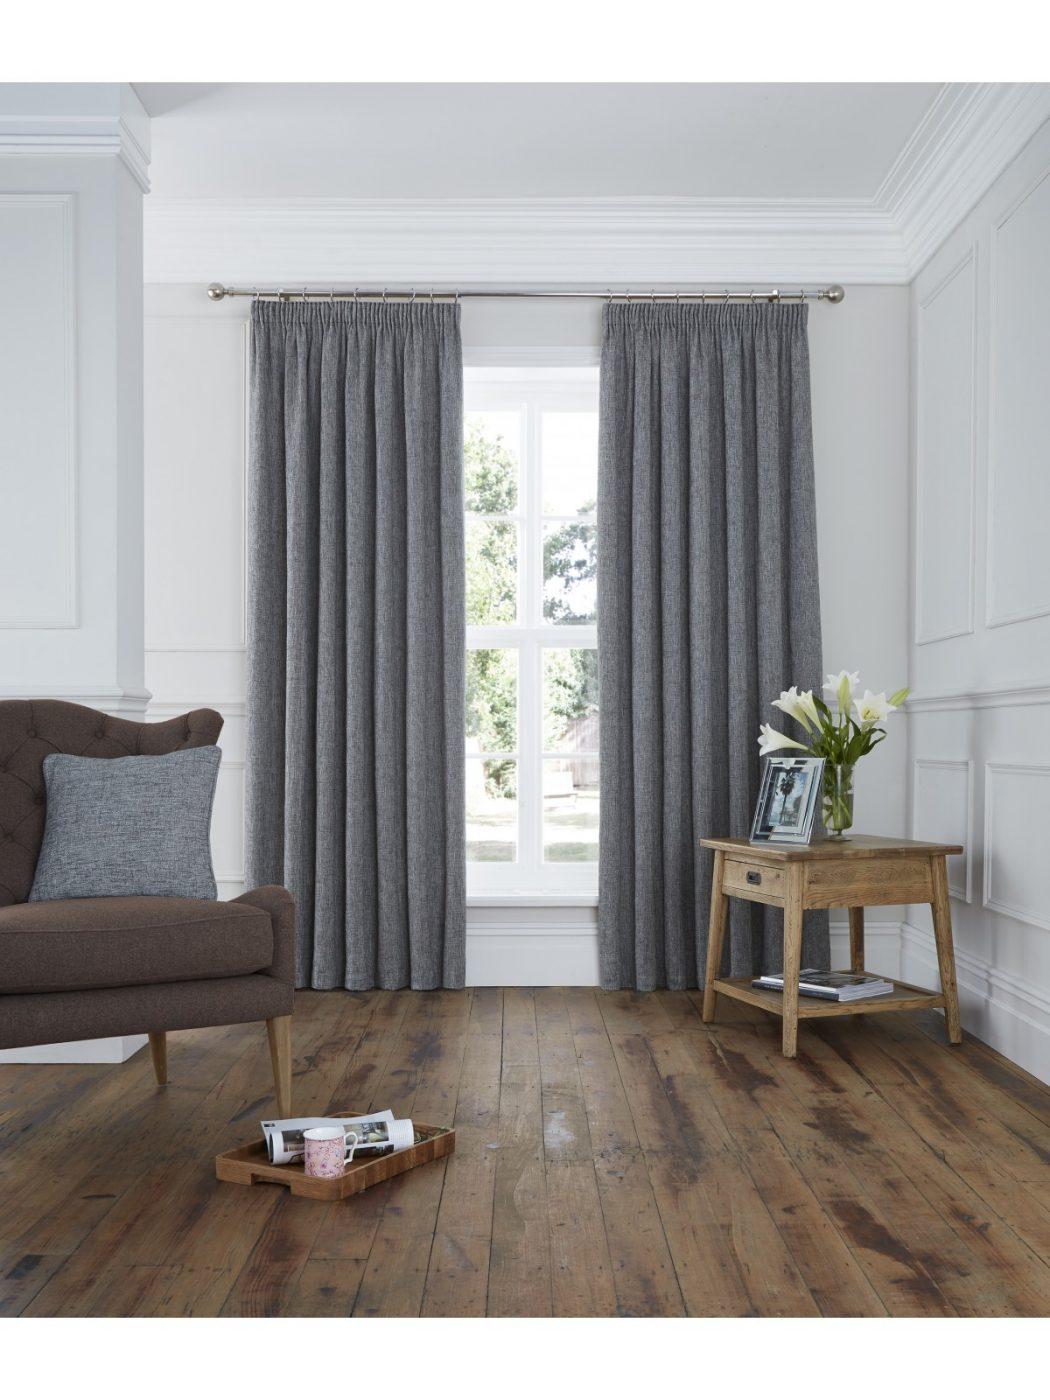 lucerne_plain_pencil_pleat_curtain_grey_1 20+ Hottest Curtain Designs for 2018